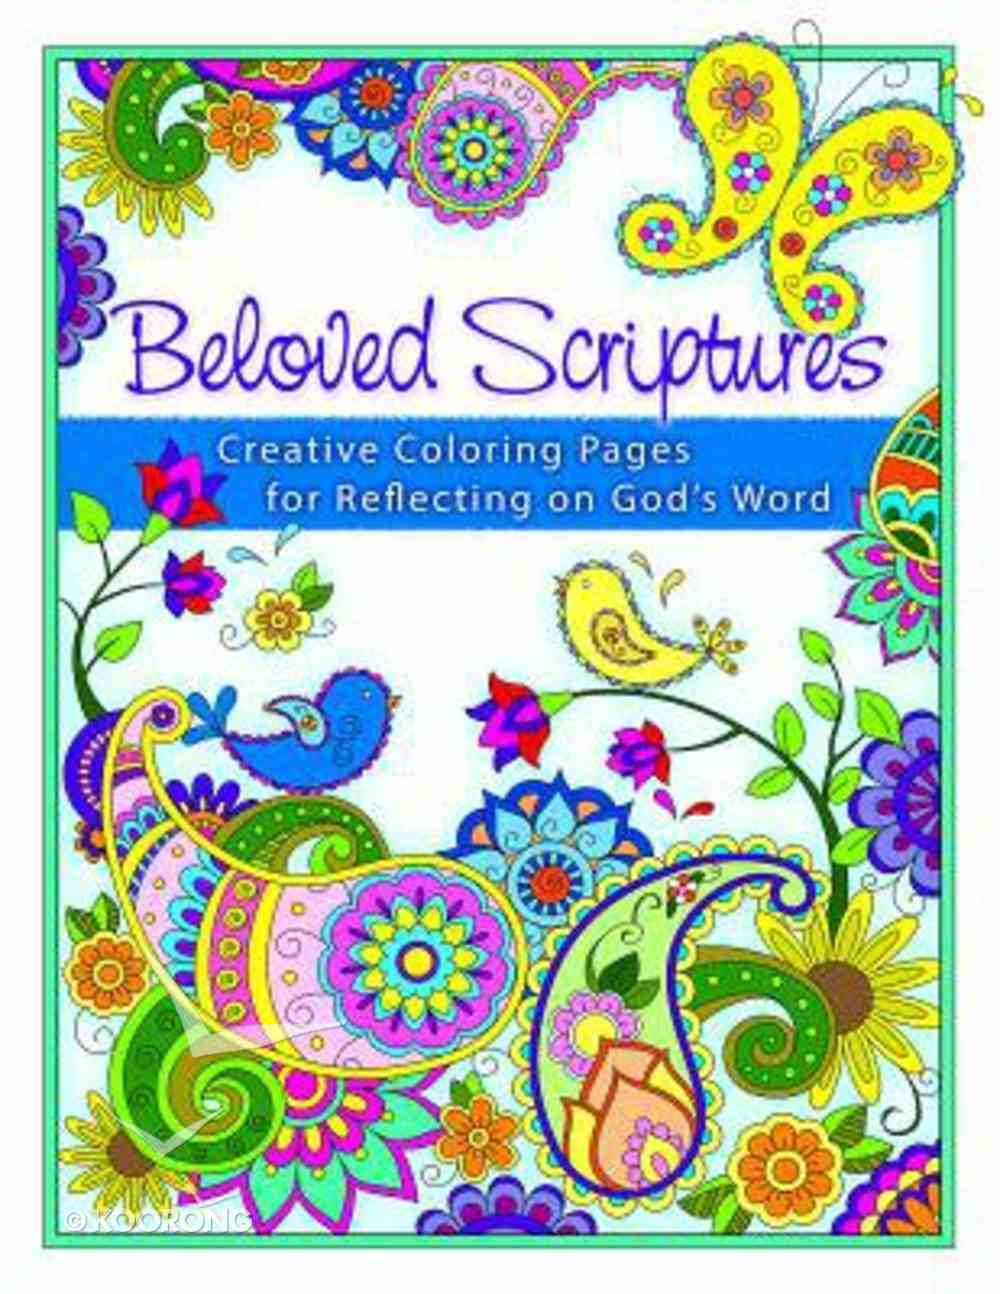 Beloved Scriptures (Adult Coloring Books Series) Paperback